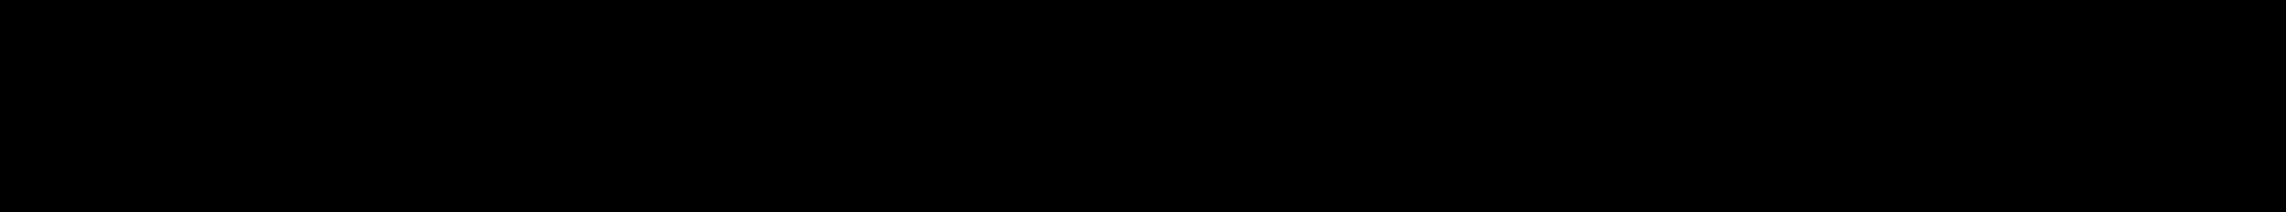 Logo Loerakker Olsson Architecten